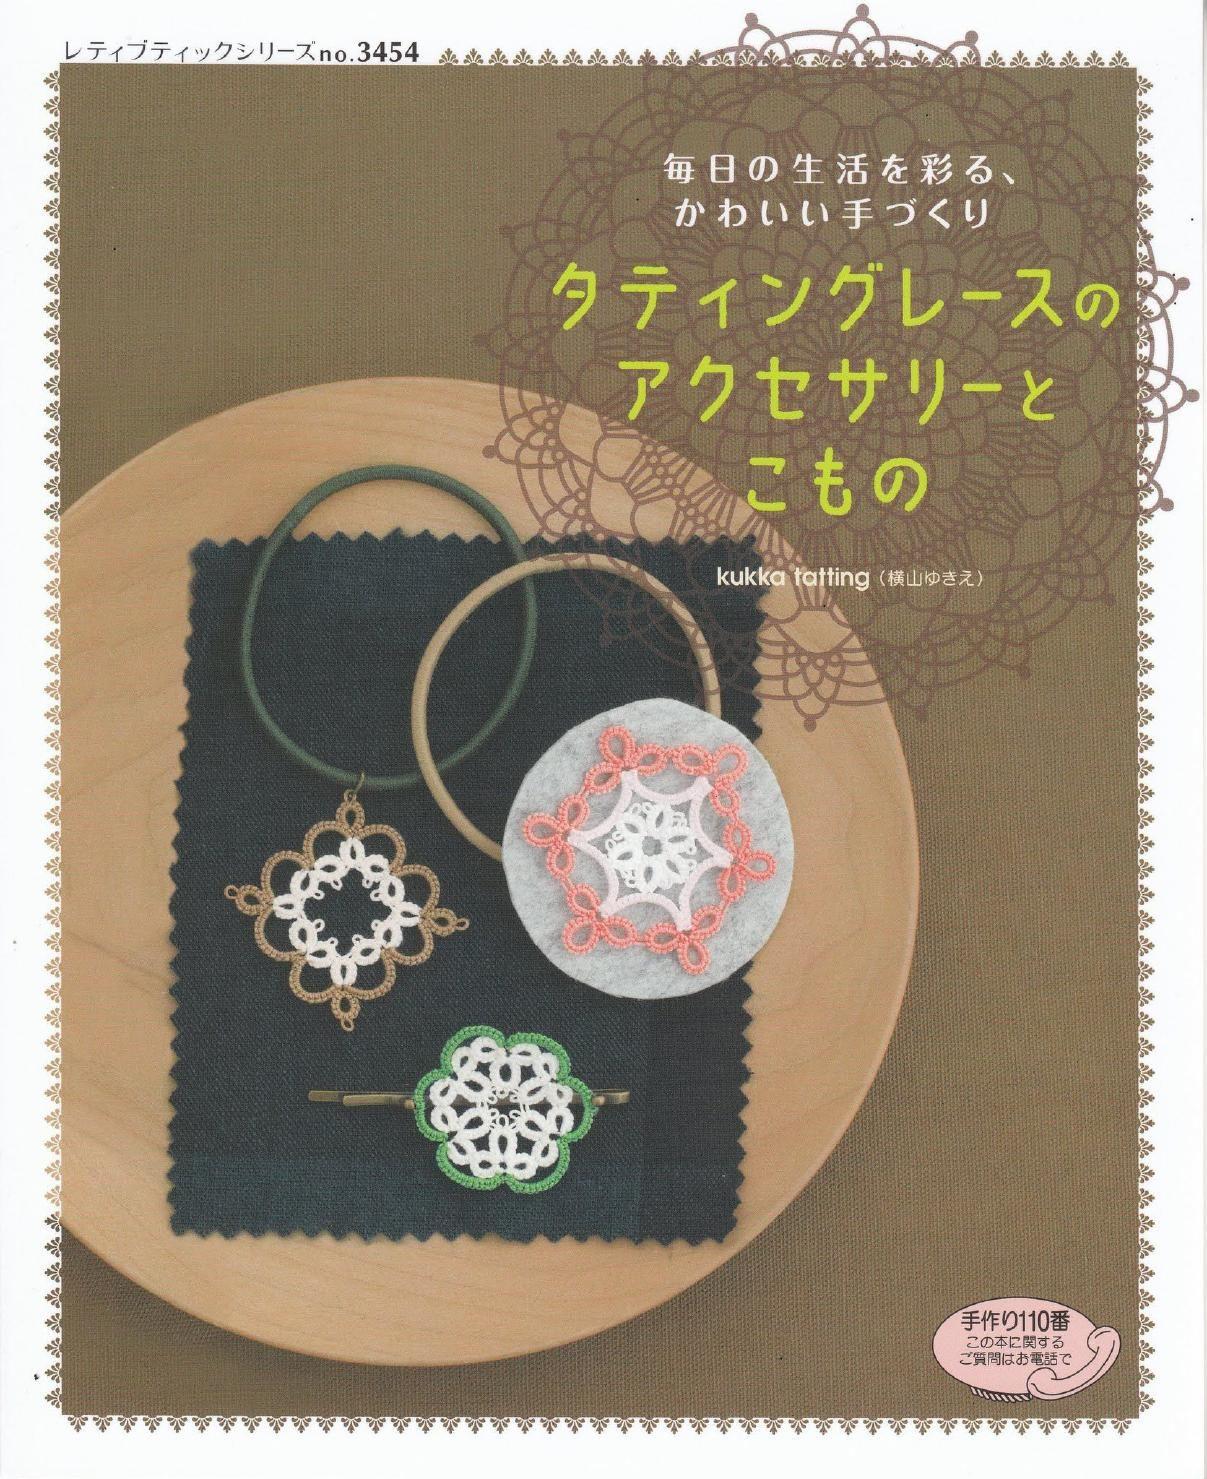 ISSUU - Tatting lace by vlinderieke